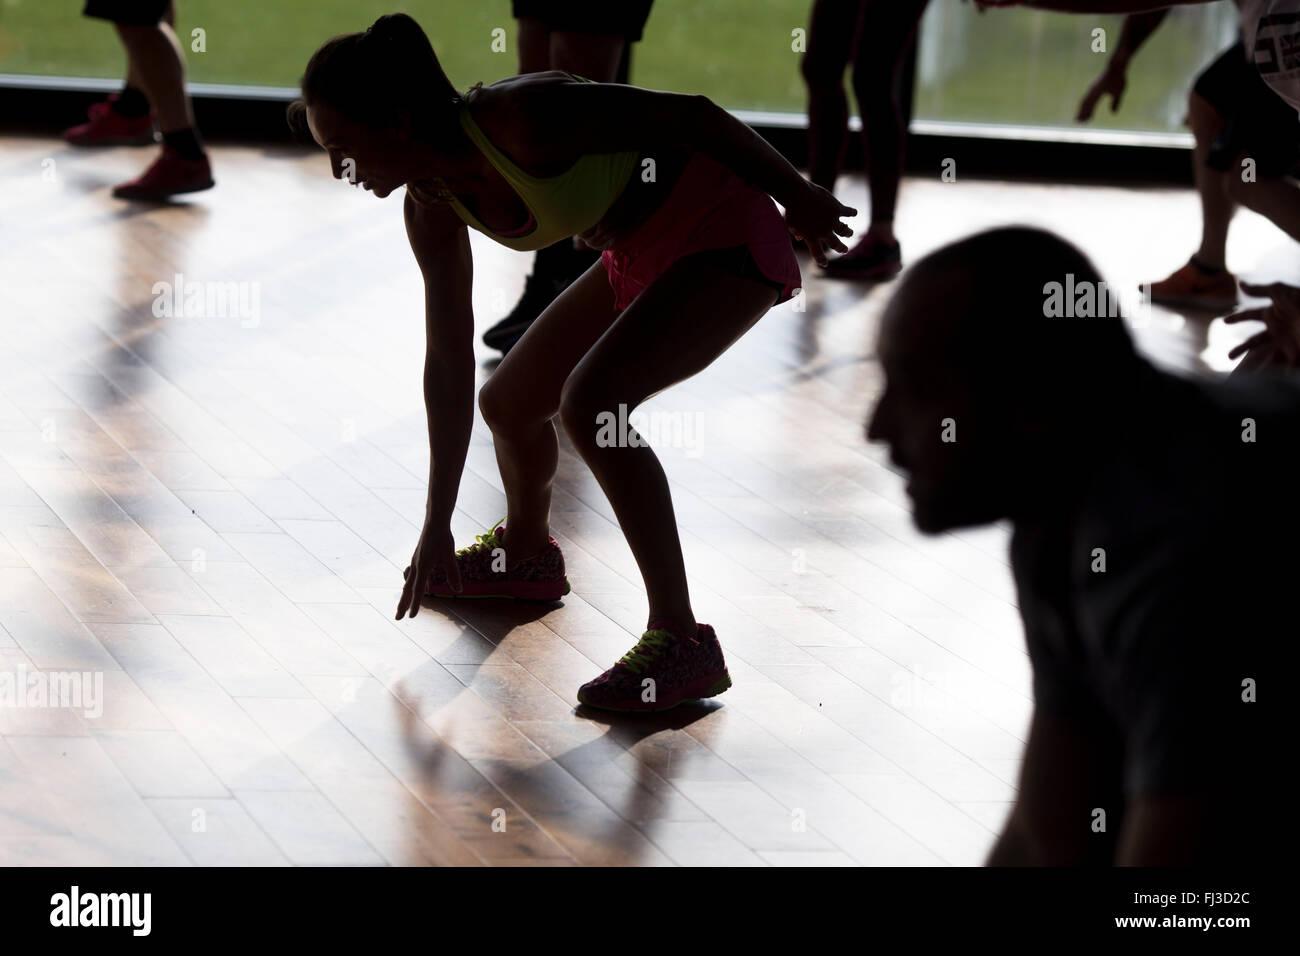 Grupo sesión de ejercicios en un gimnasio Imagen De Stock